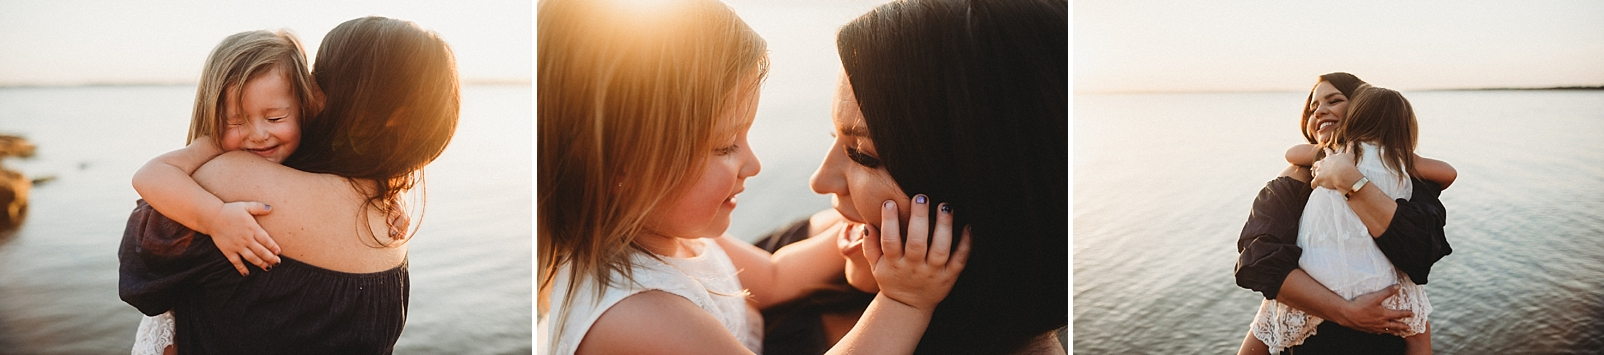 twyla jones photography - www.twylajones.com - sunset family maternity photoshoot dallas texas lake-TDJ_0089.jpg